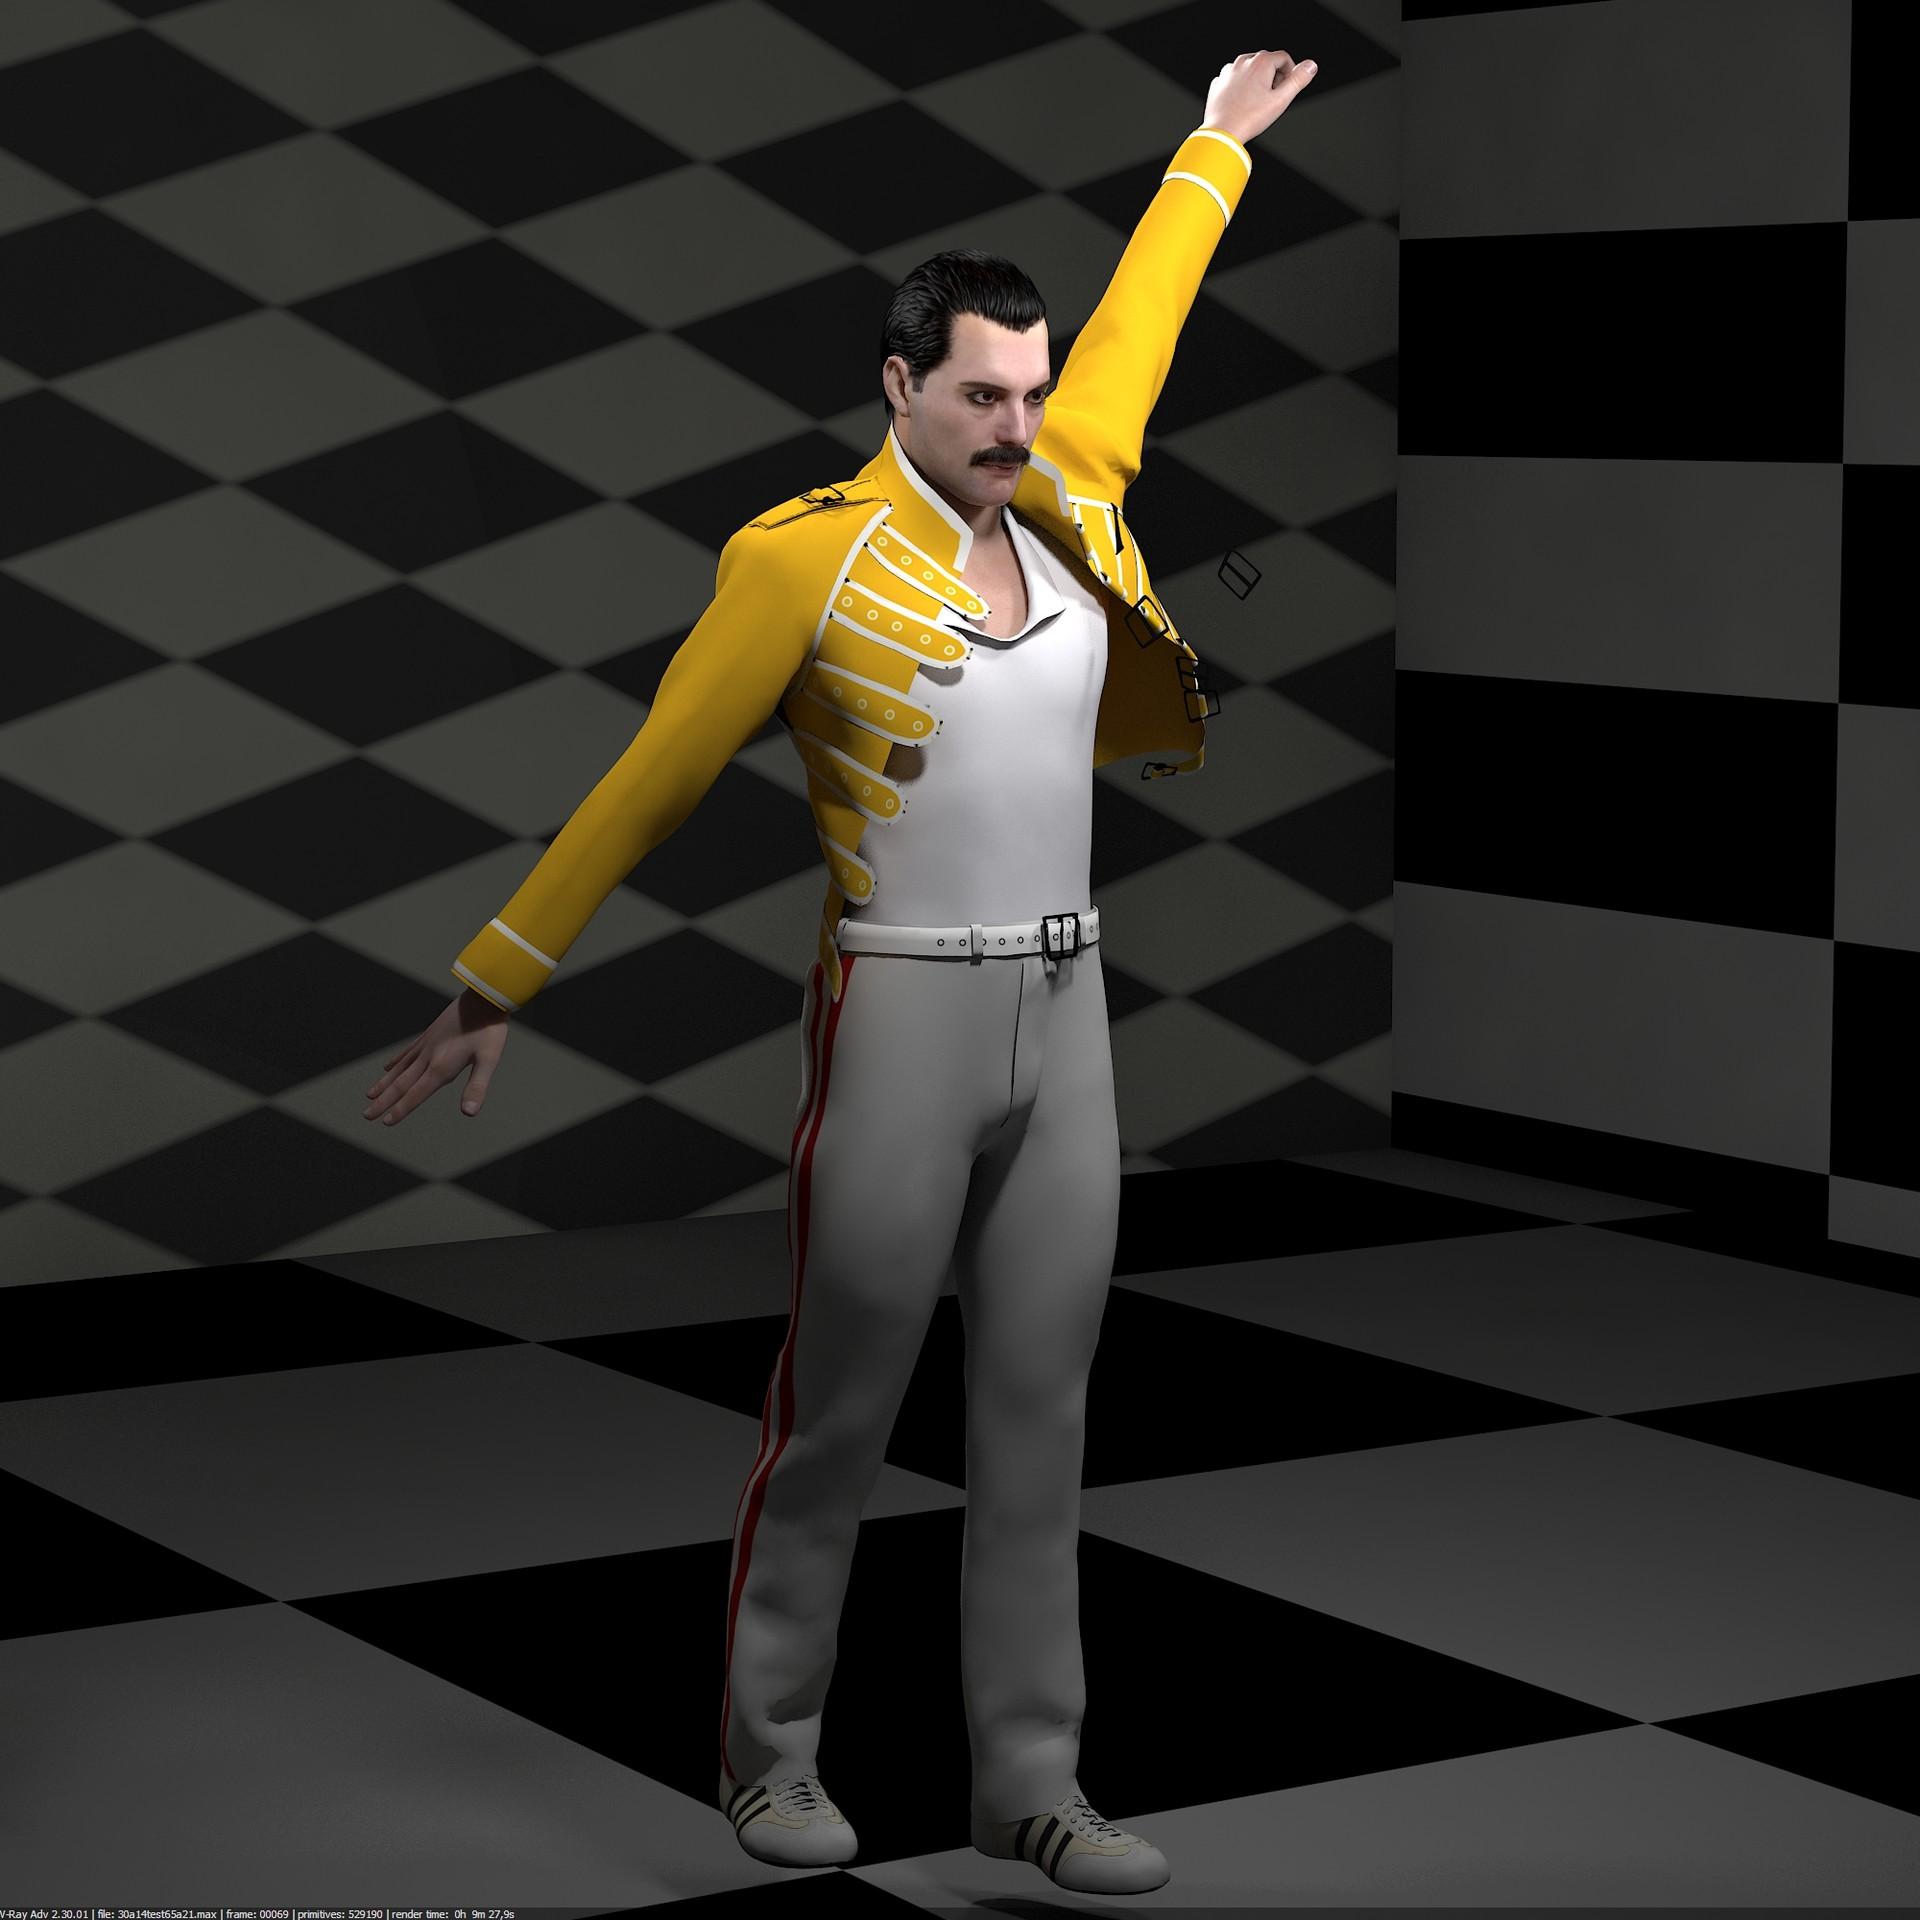 ArtStation - 3d model of Freddie Mercury singer rigged and animated